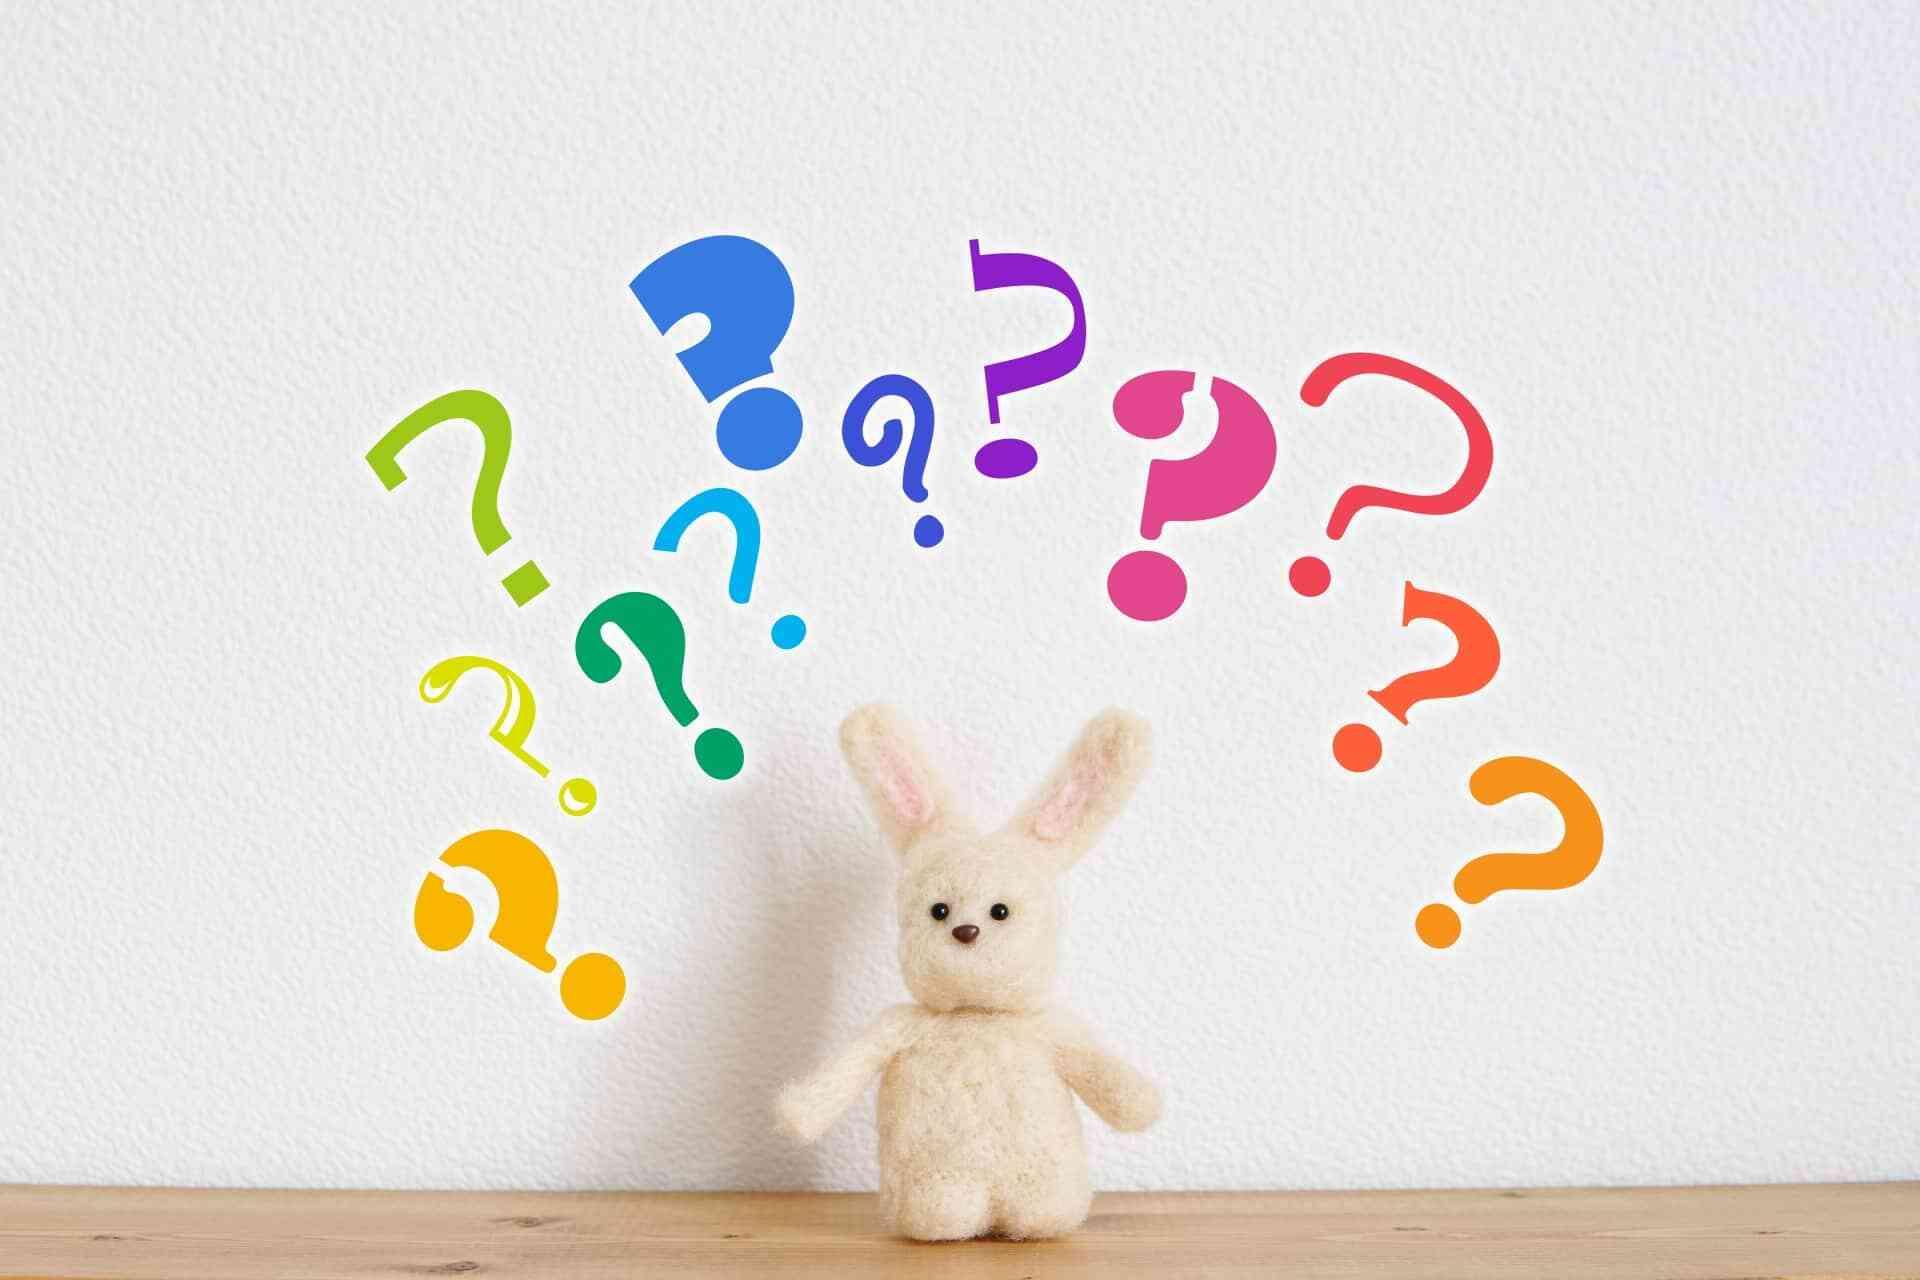 SPIの性格検査で企業は何がわかる?就活で行うべき対策と回答のコツを紹介